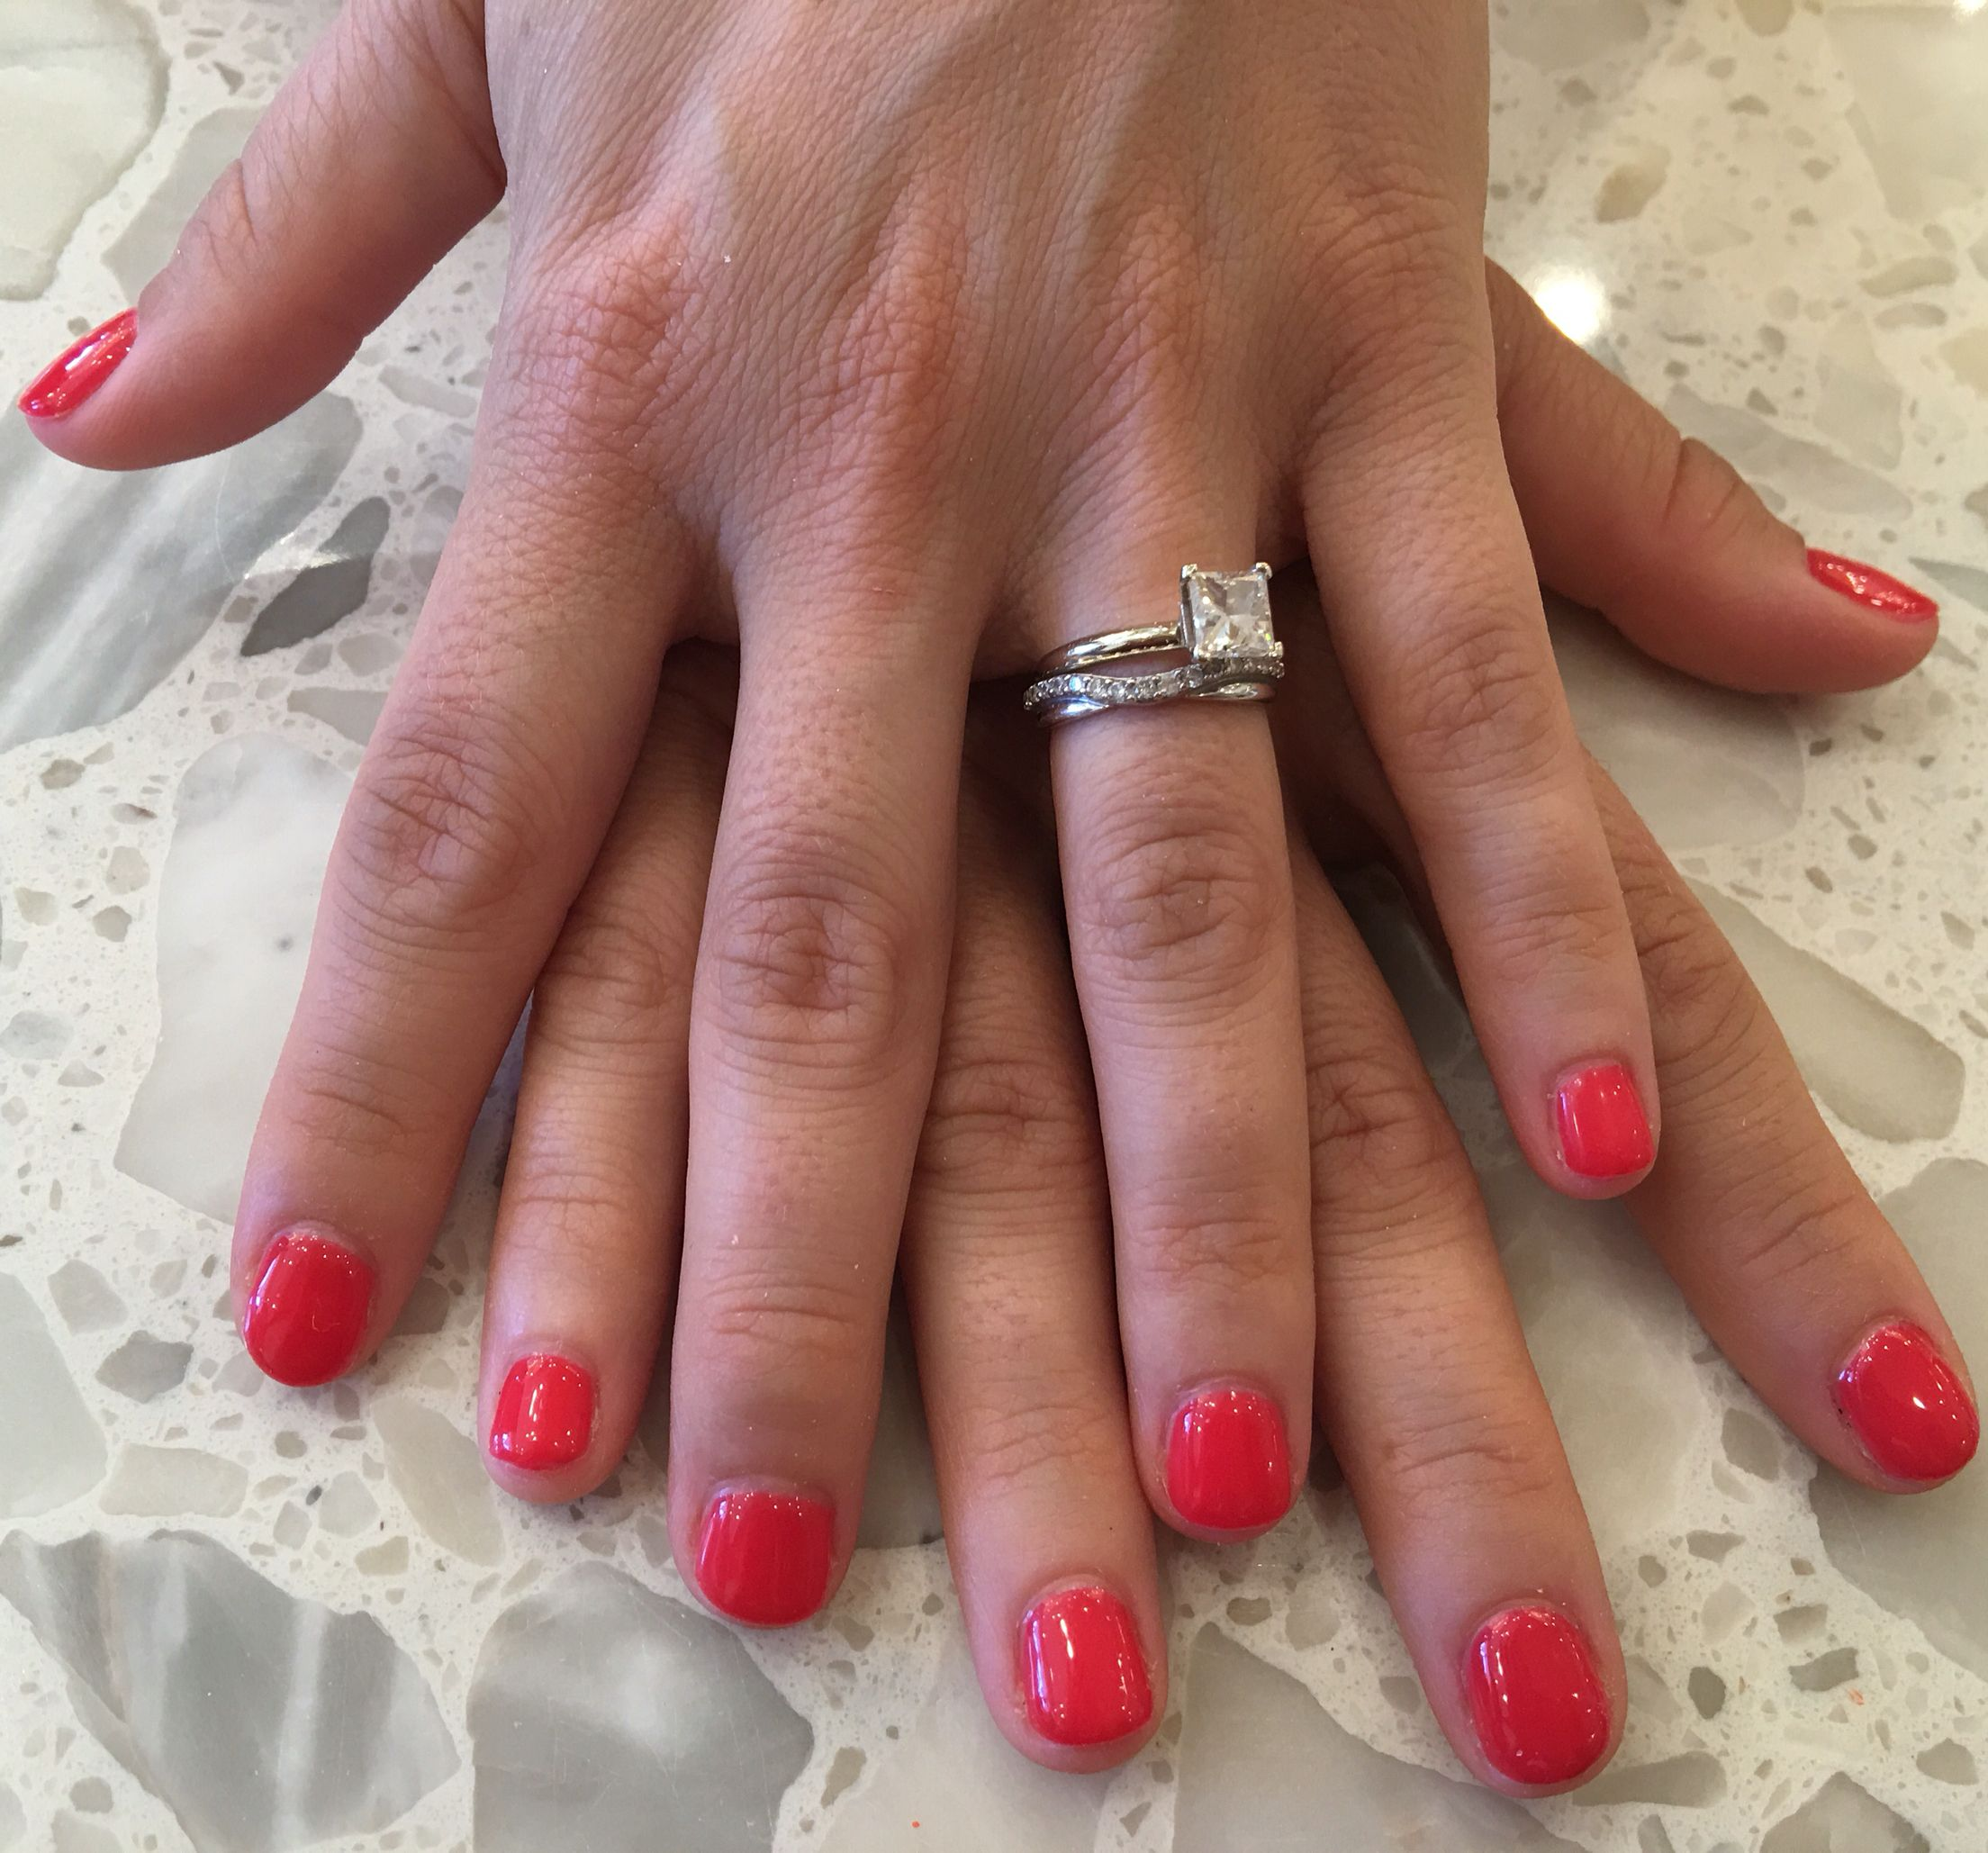 Helen By Cacee Cacee Nomani Gelpolish Gelcolor Gelnails Southwestcharlotte Envynailspaclt Gel Nails Nail Spa Gel Color